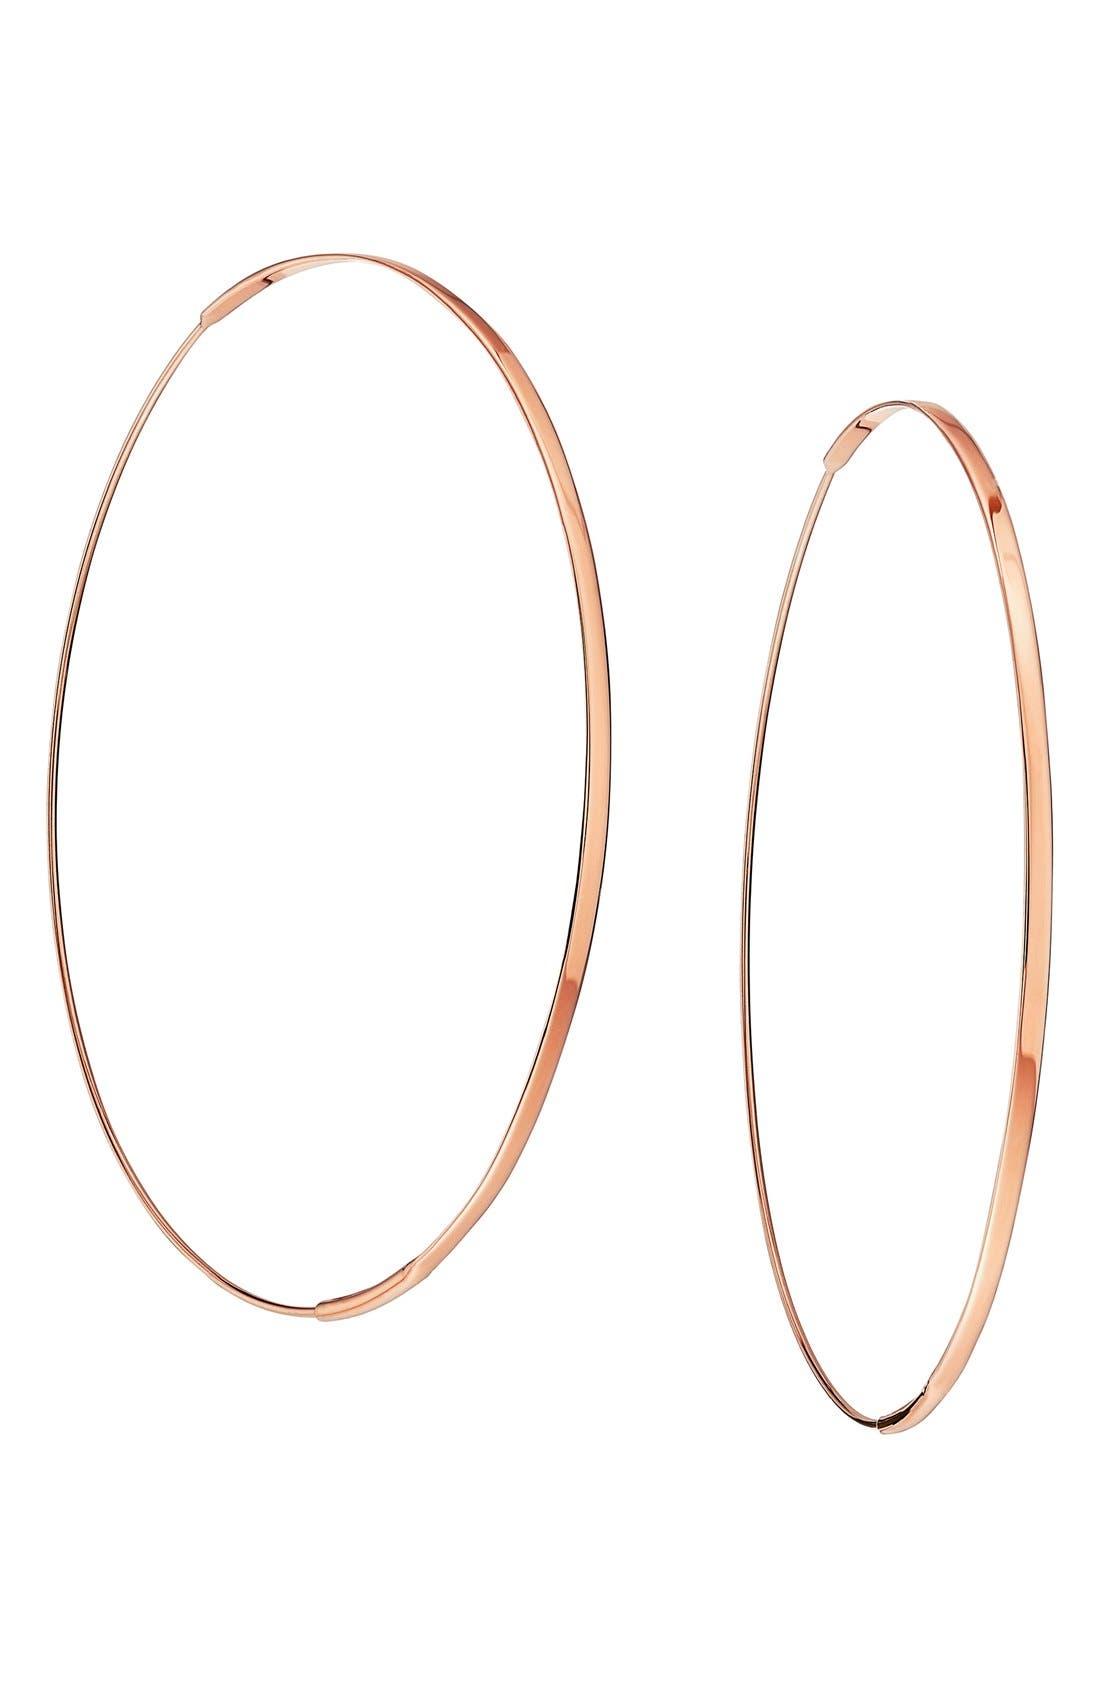 LANA JEWELRY Large Flat Magic Hoop Earrings